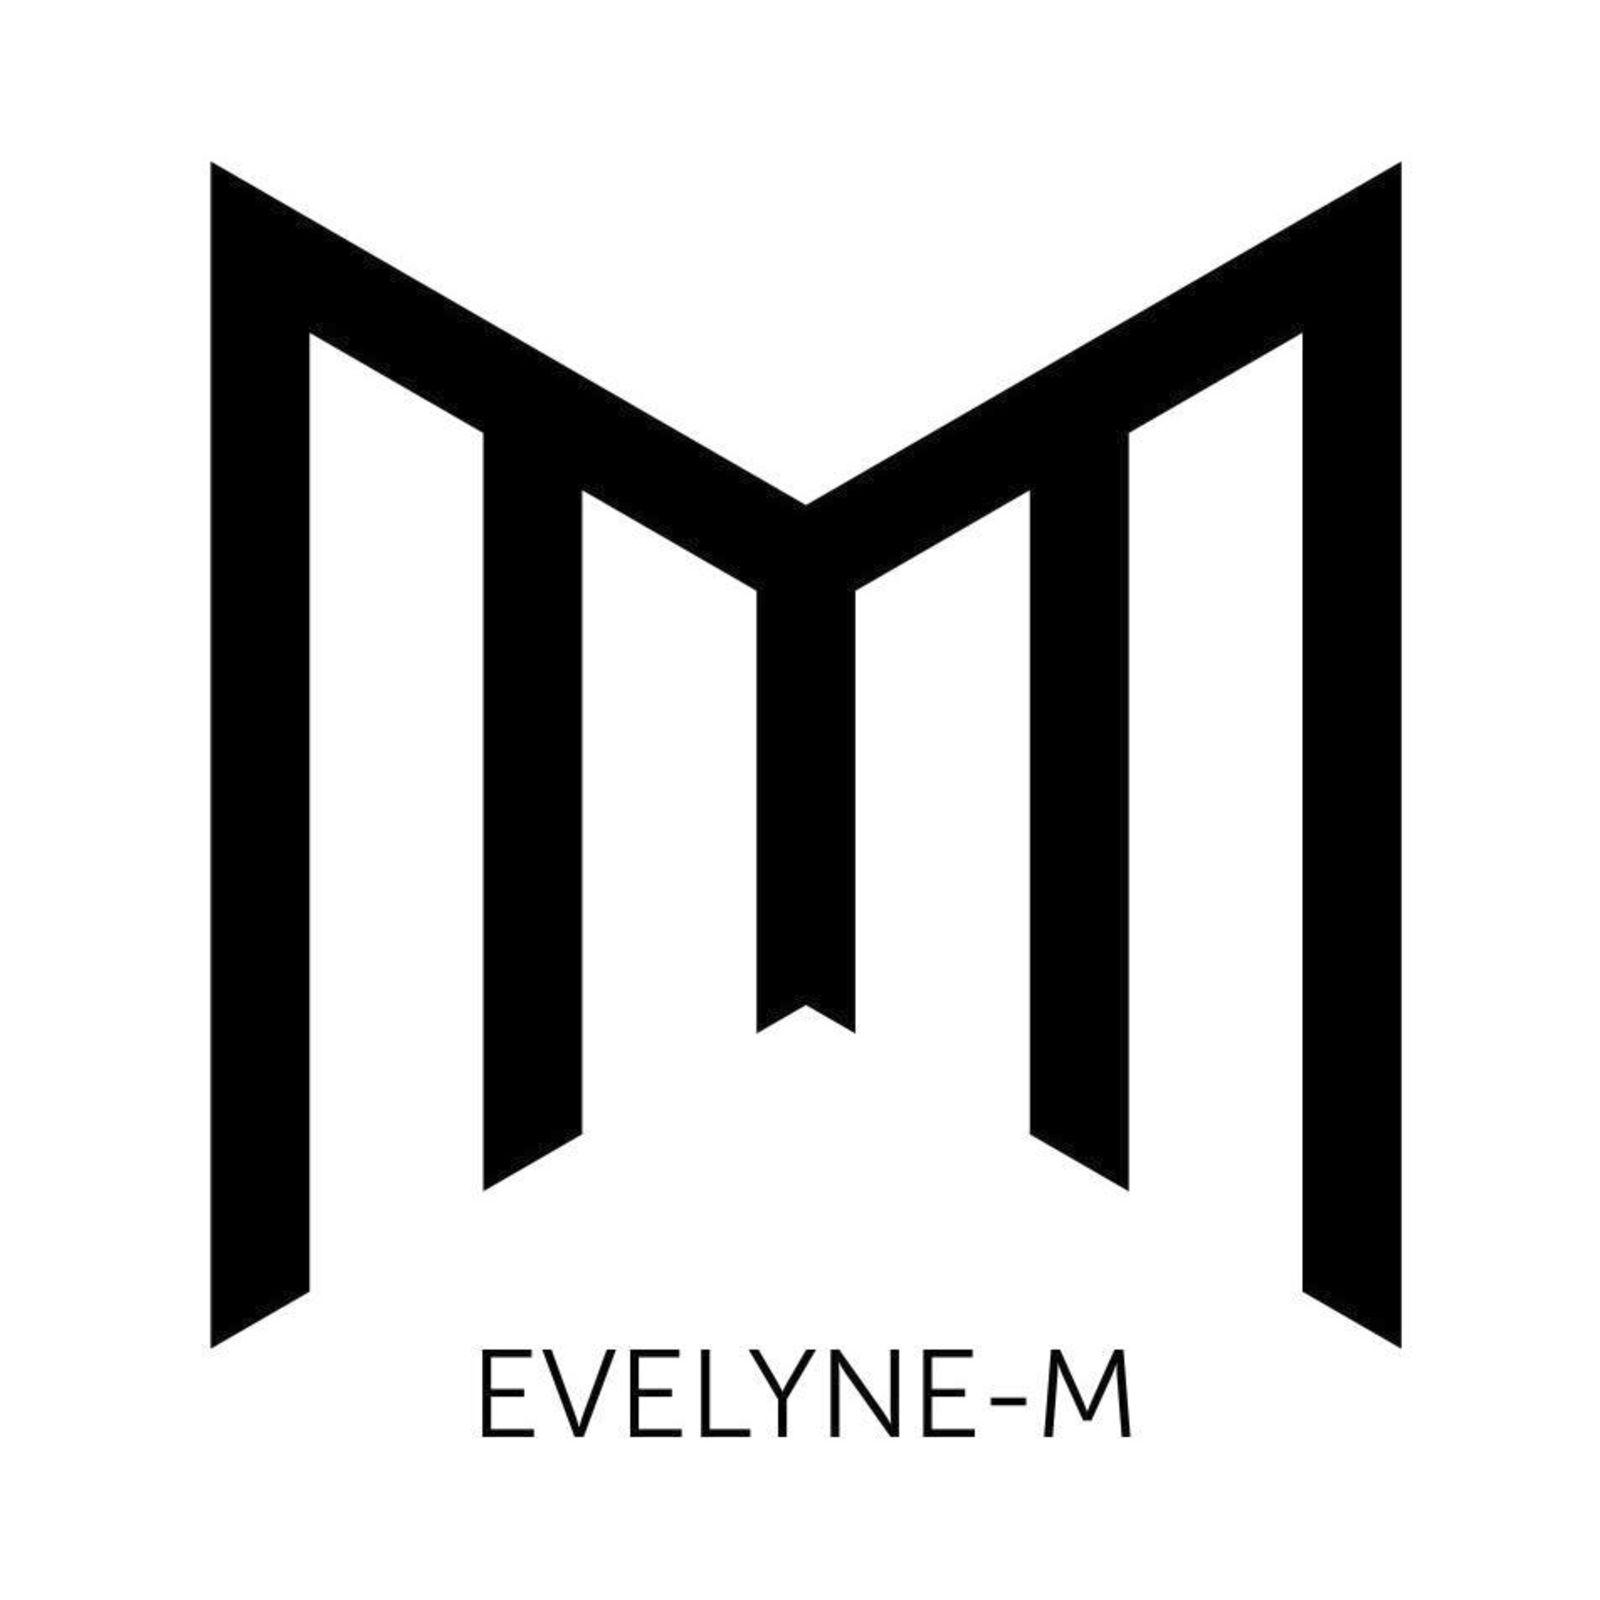 EVELYNE-M (Bild 1)